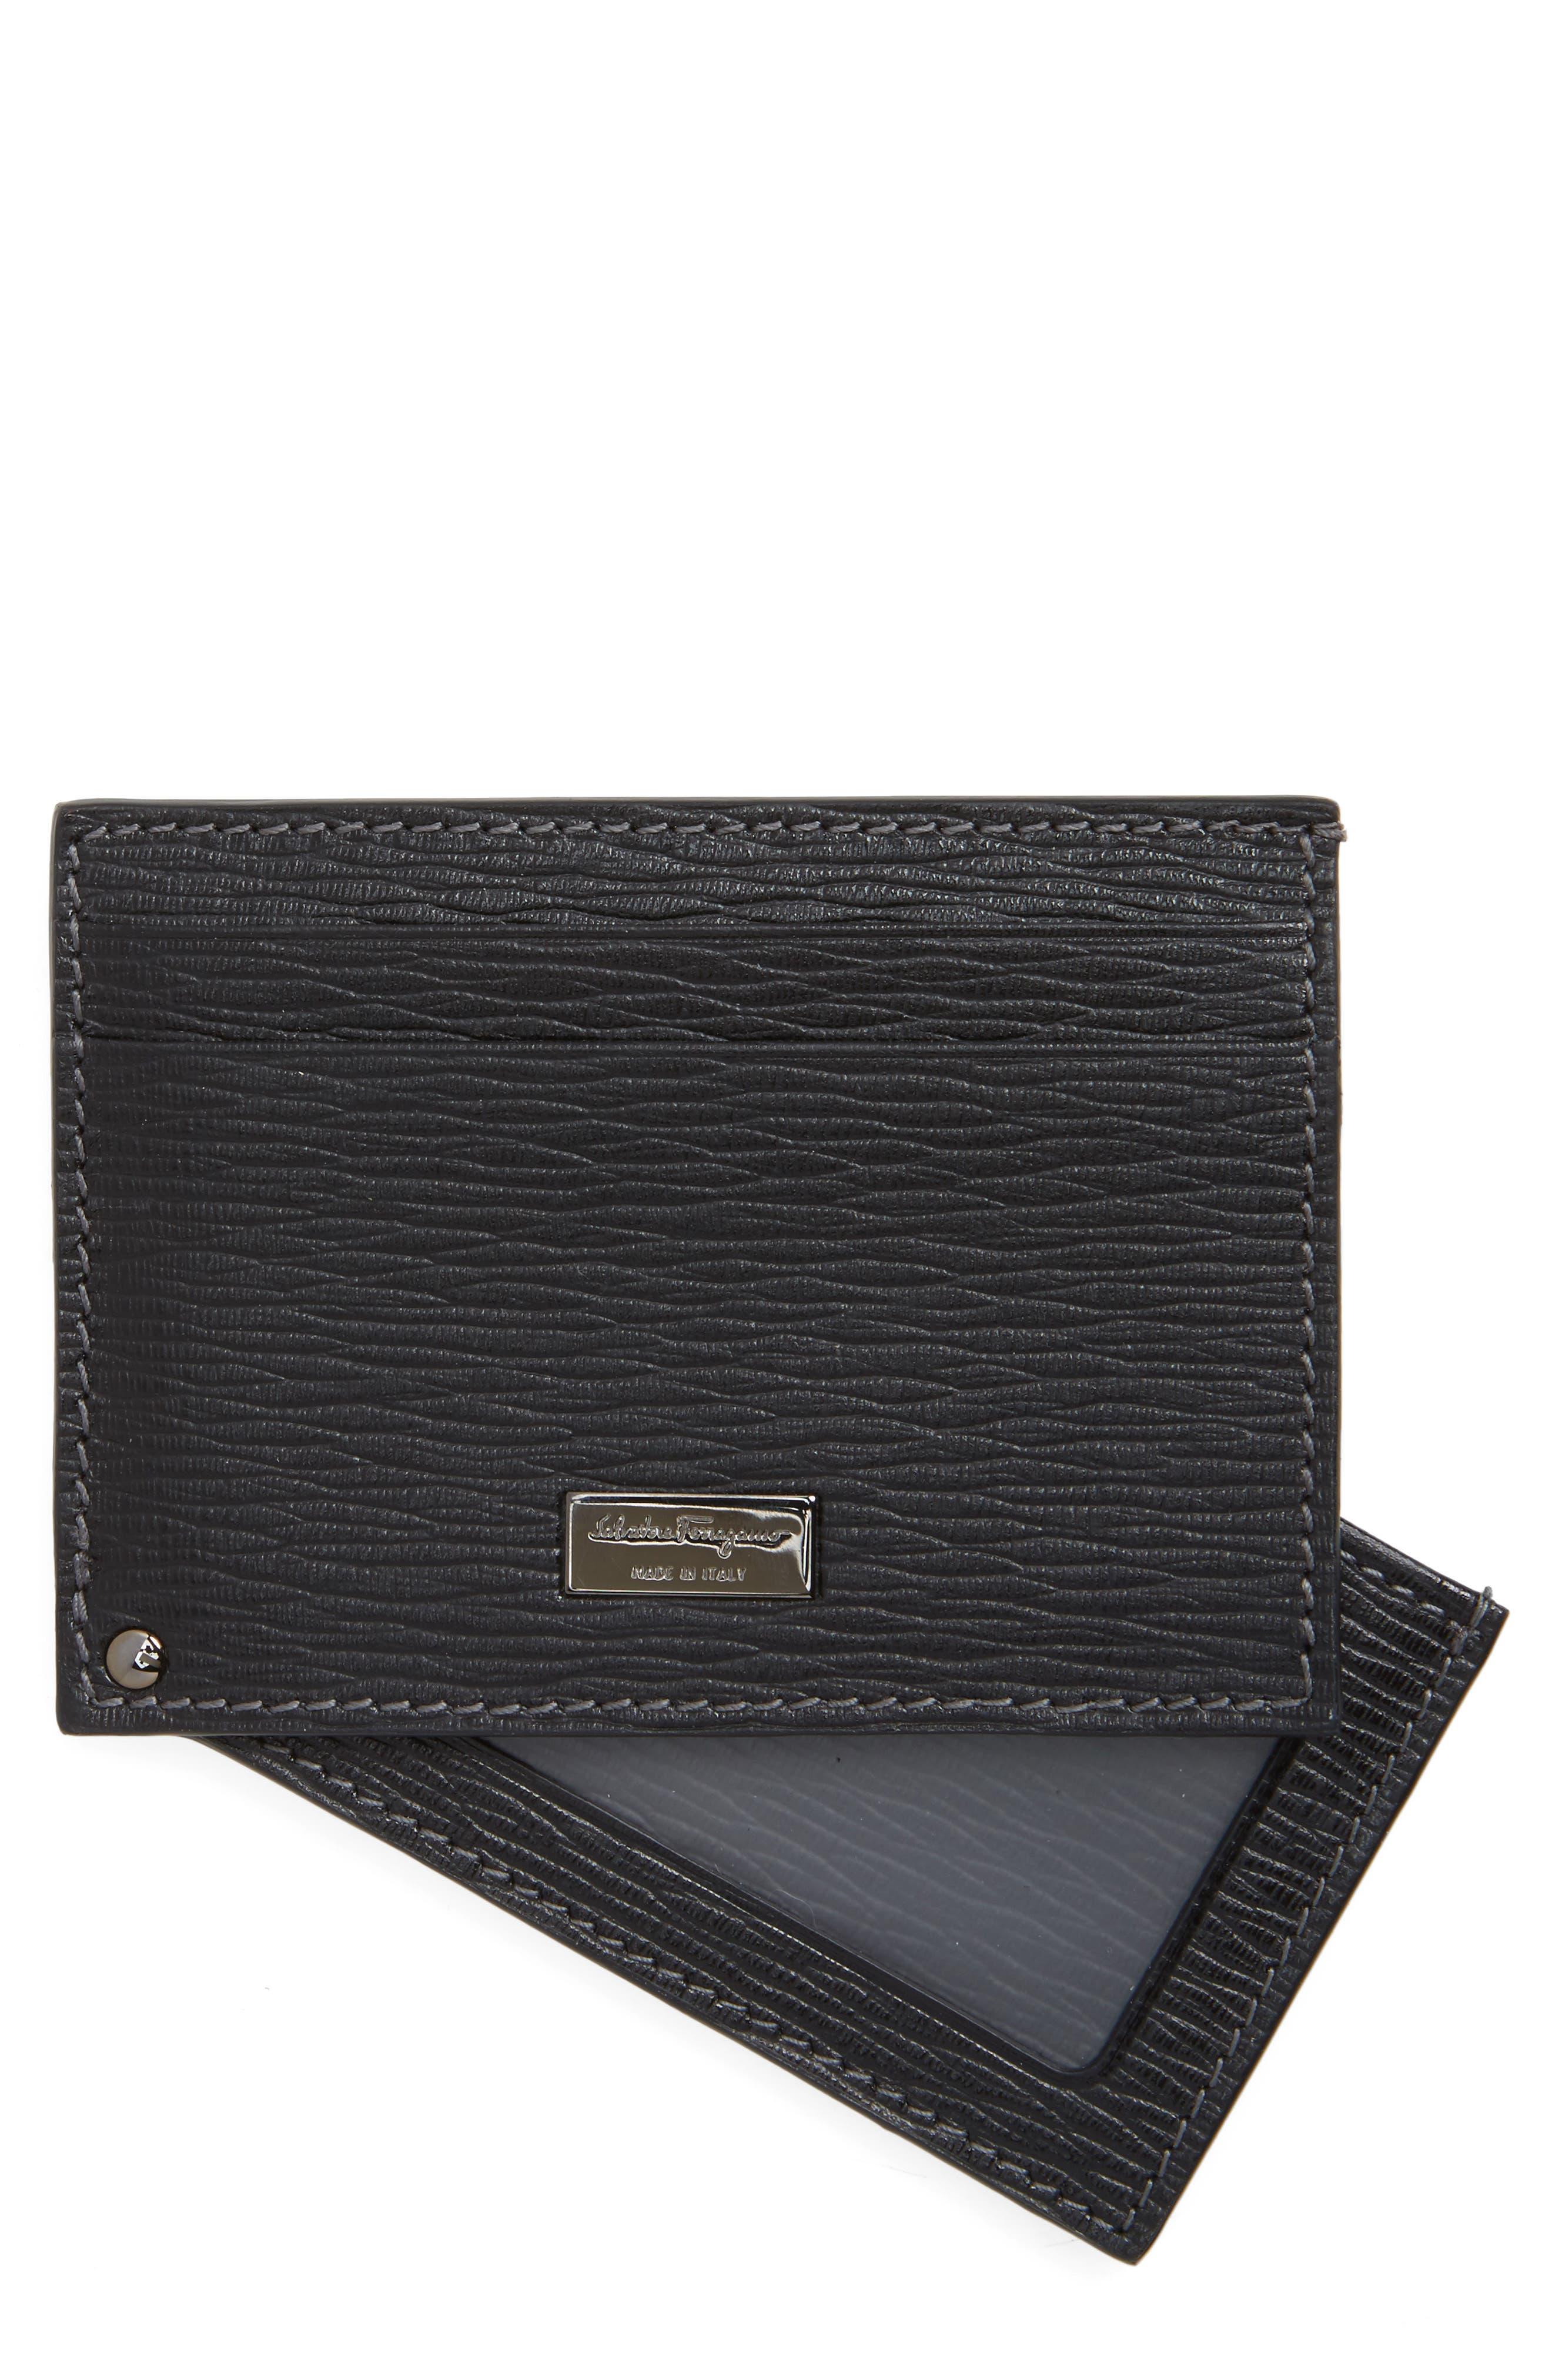 Main Image - Salvatore Ferragamo Leather Card Case